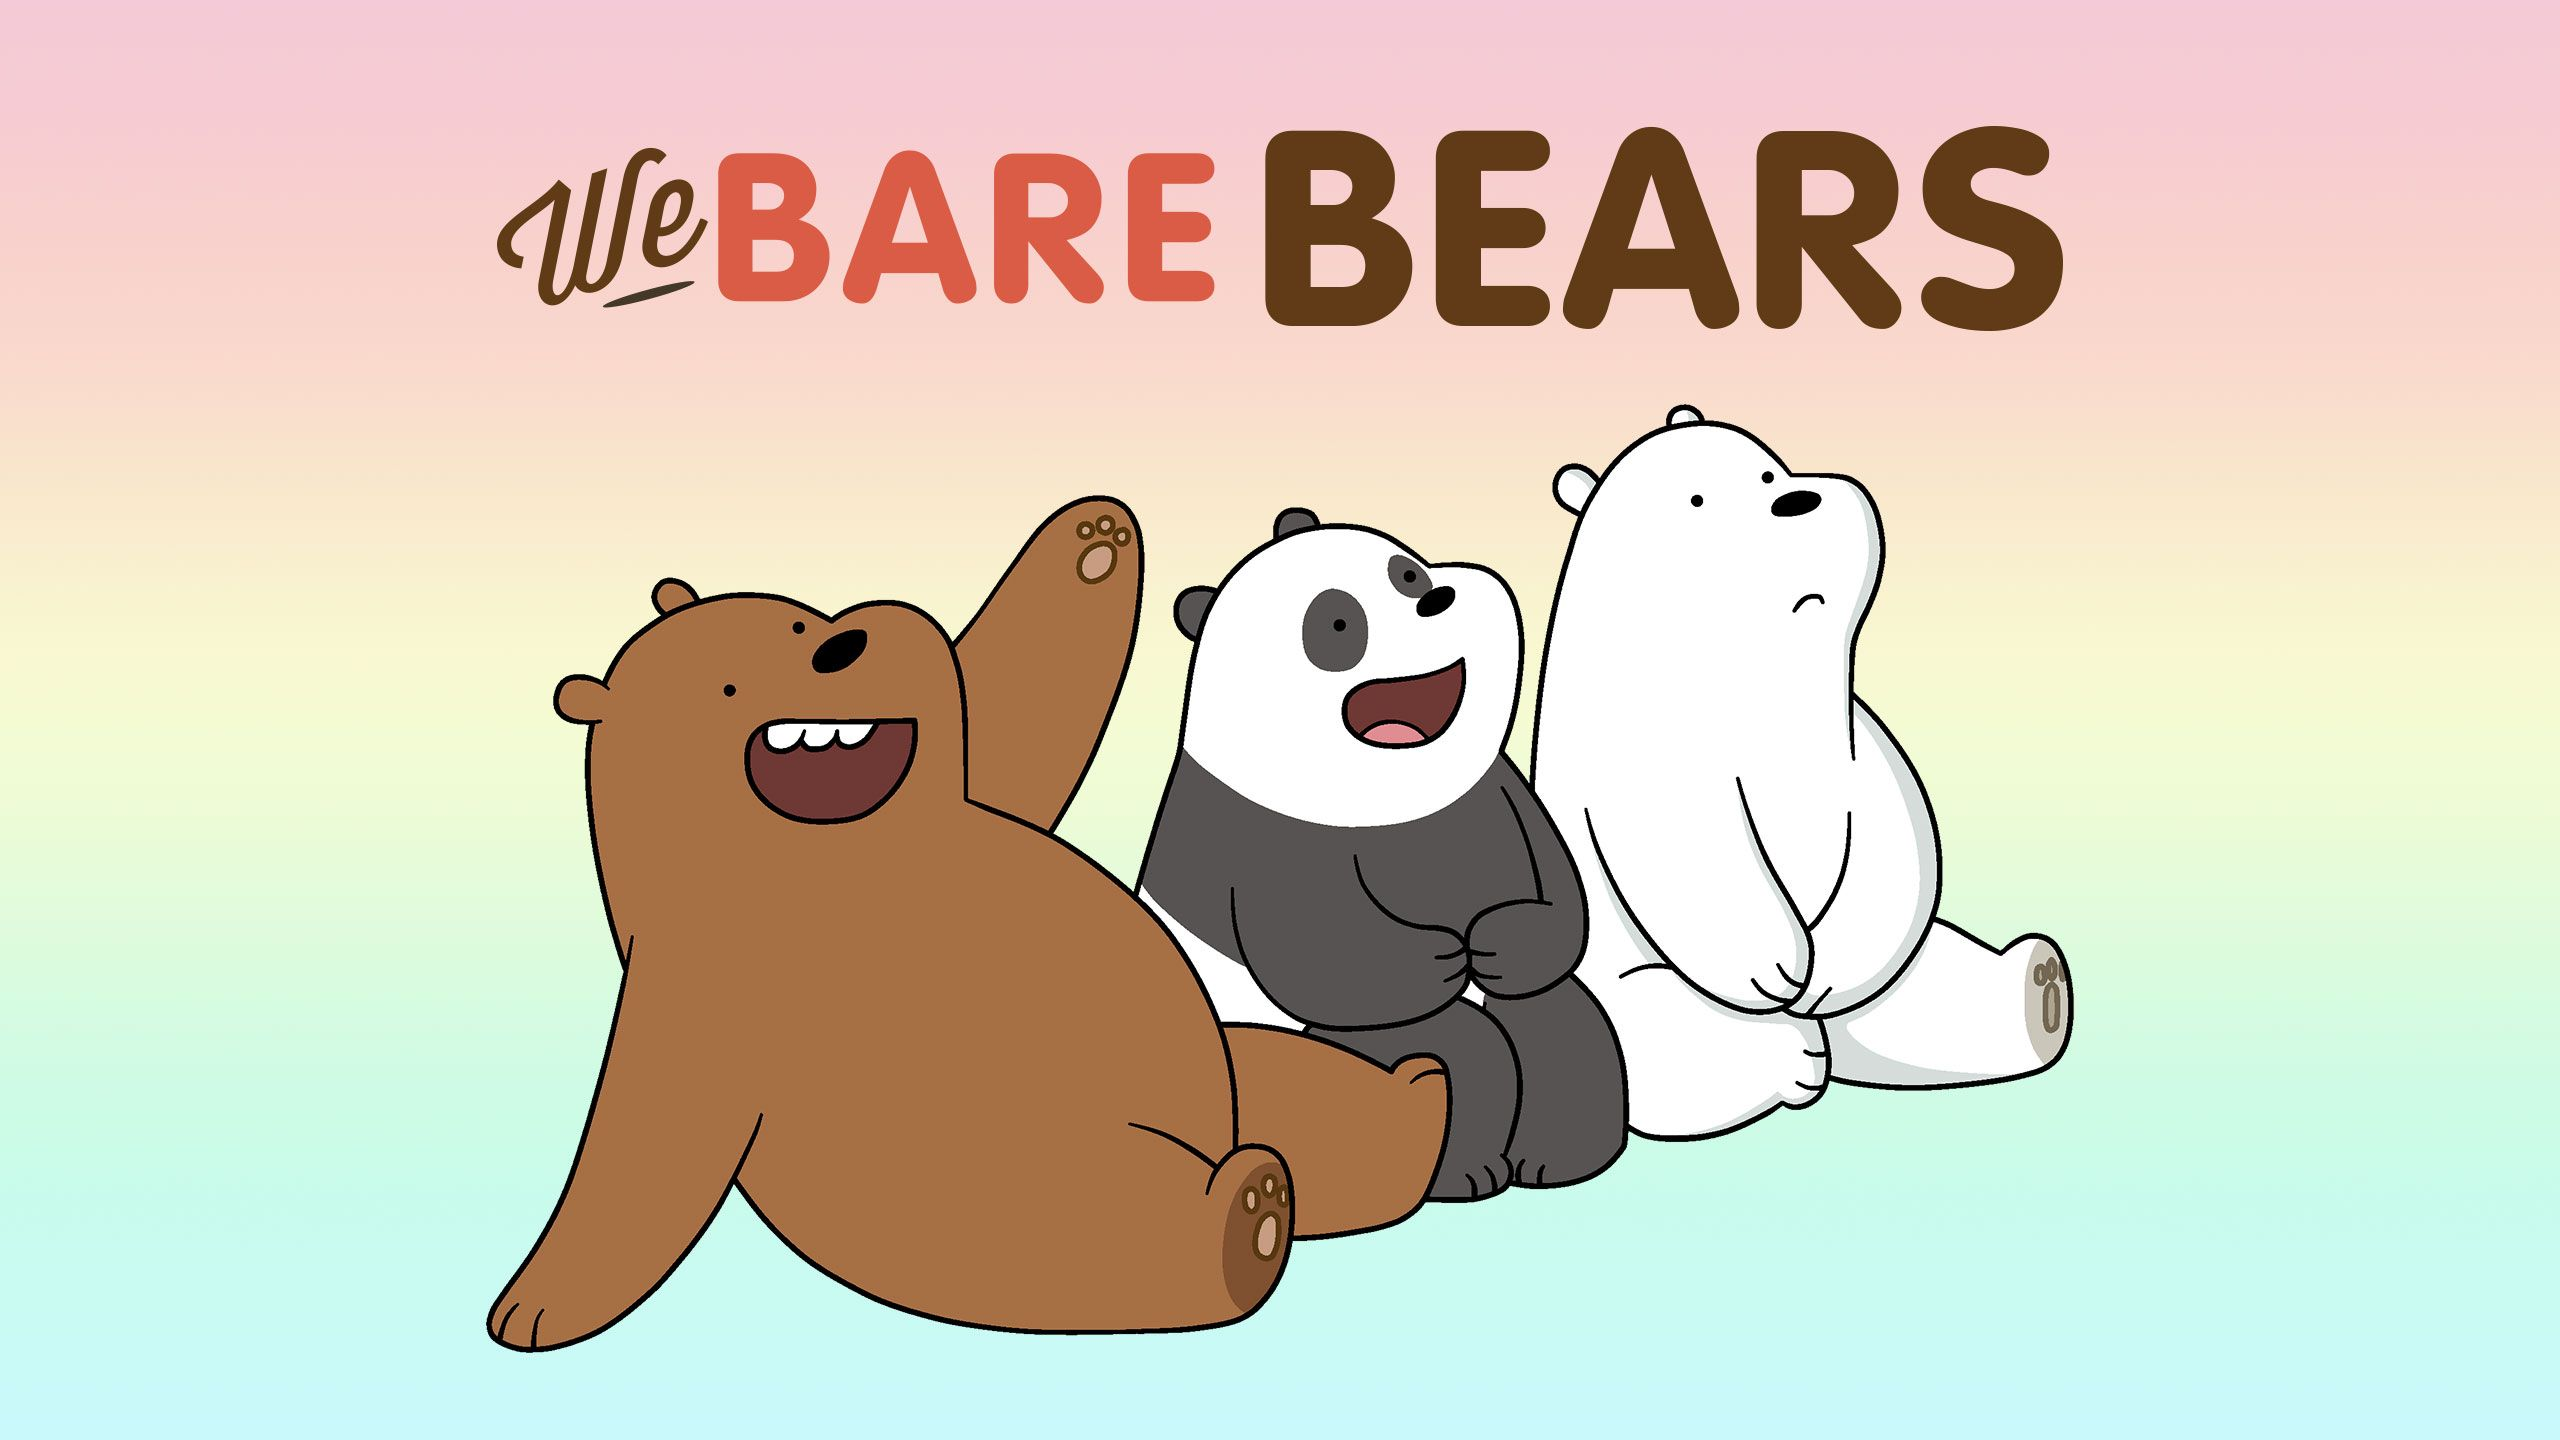 We Bare Bears Desktop Wallpapers - Top Free We Bare Bears ...